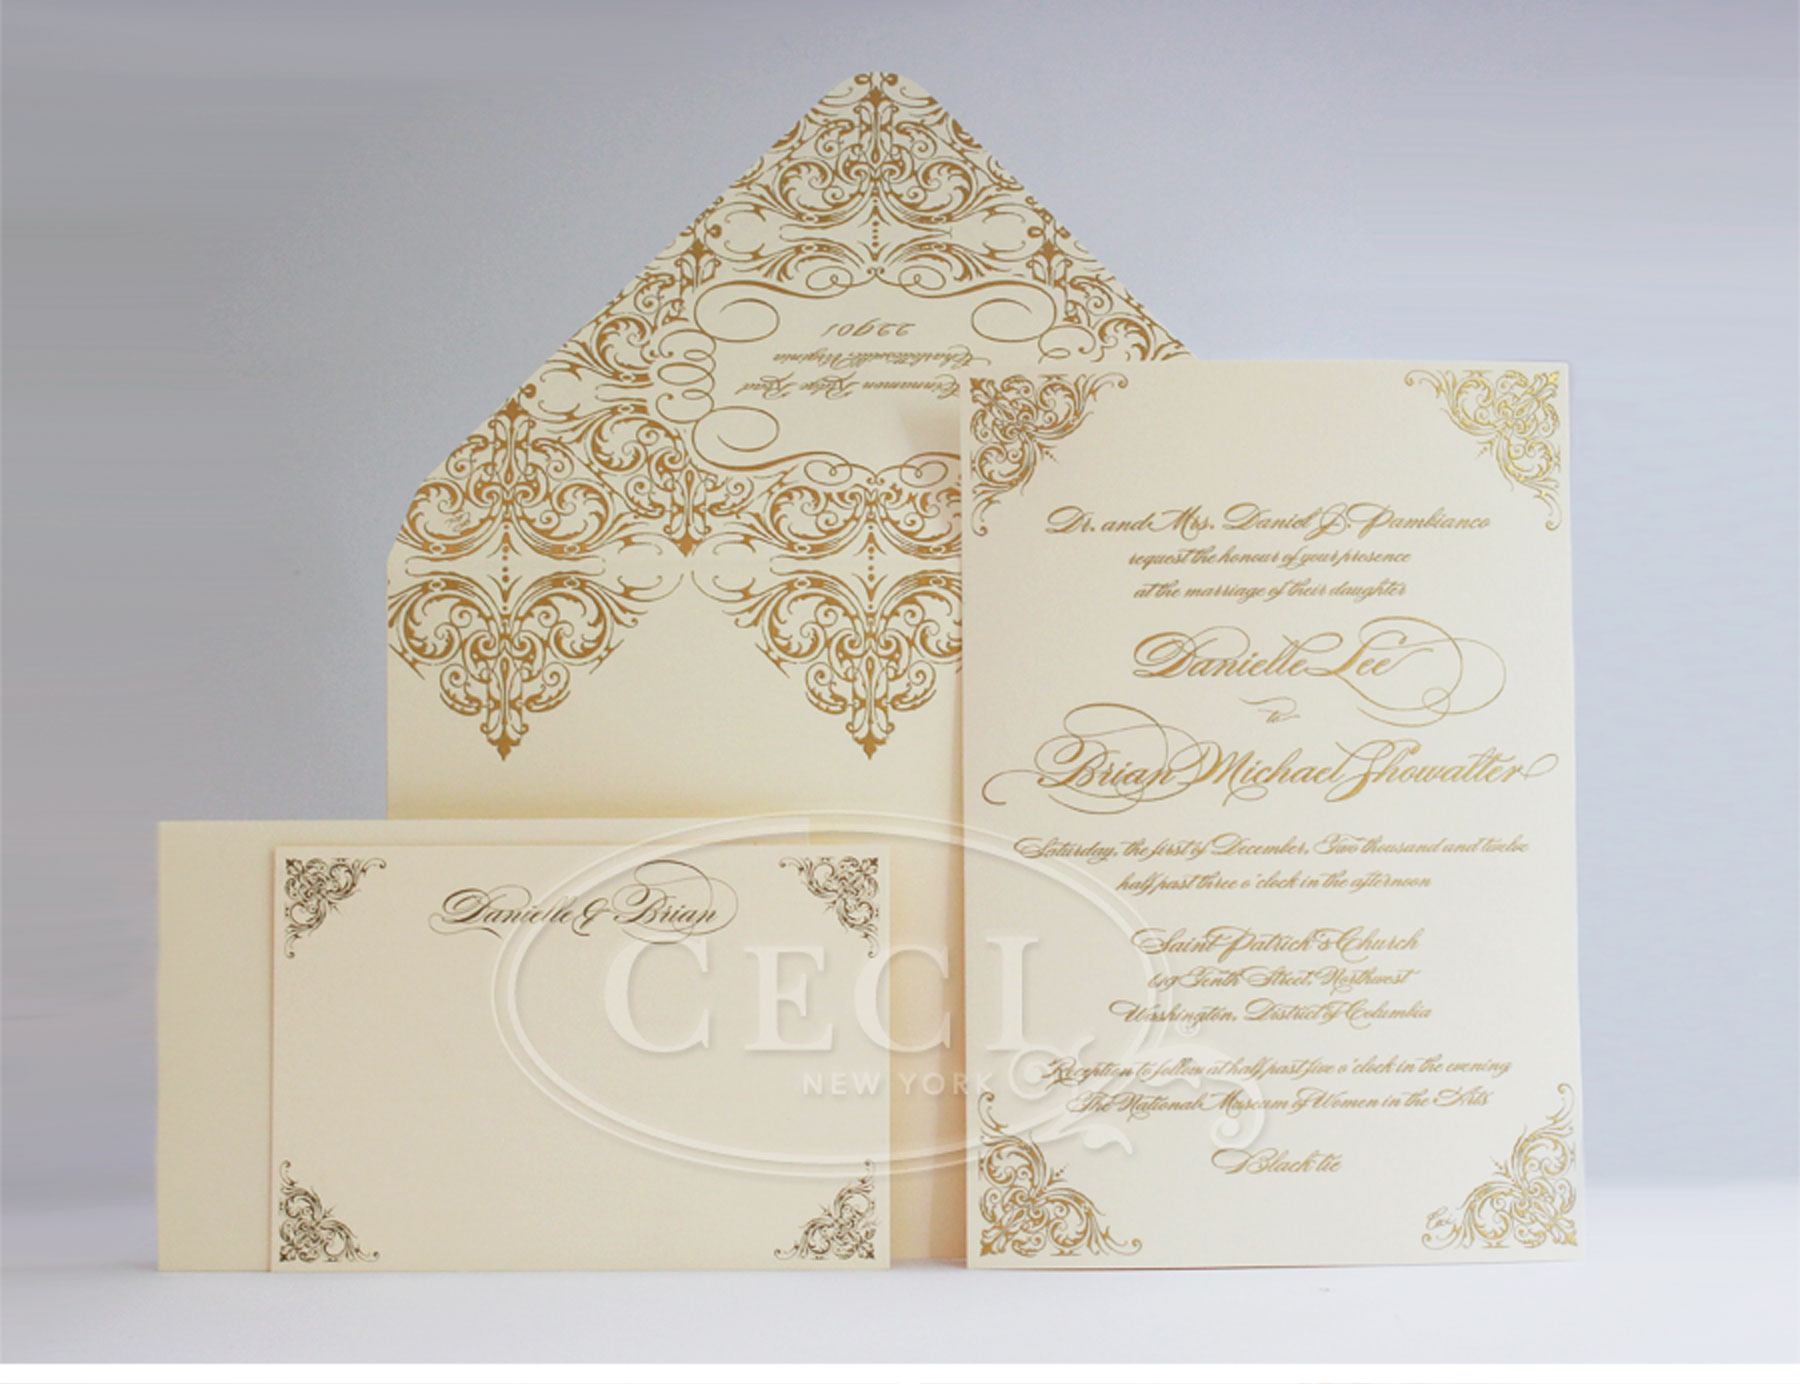 Ivory Wedding Invitations: Elegant Masquerade Wedding: Danielle And